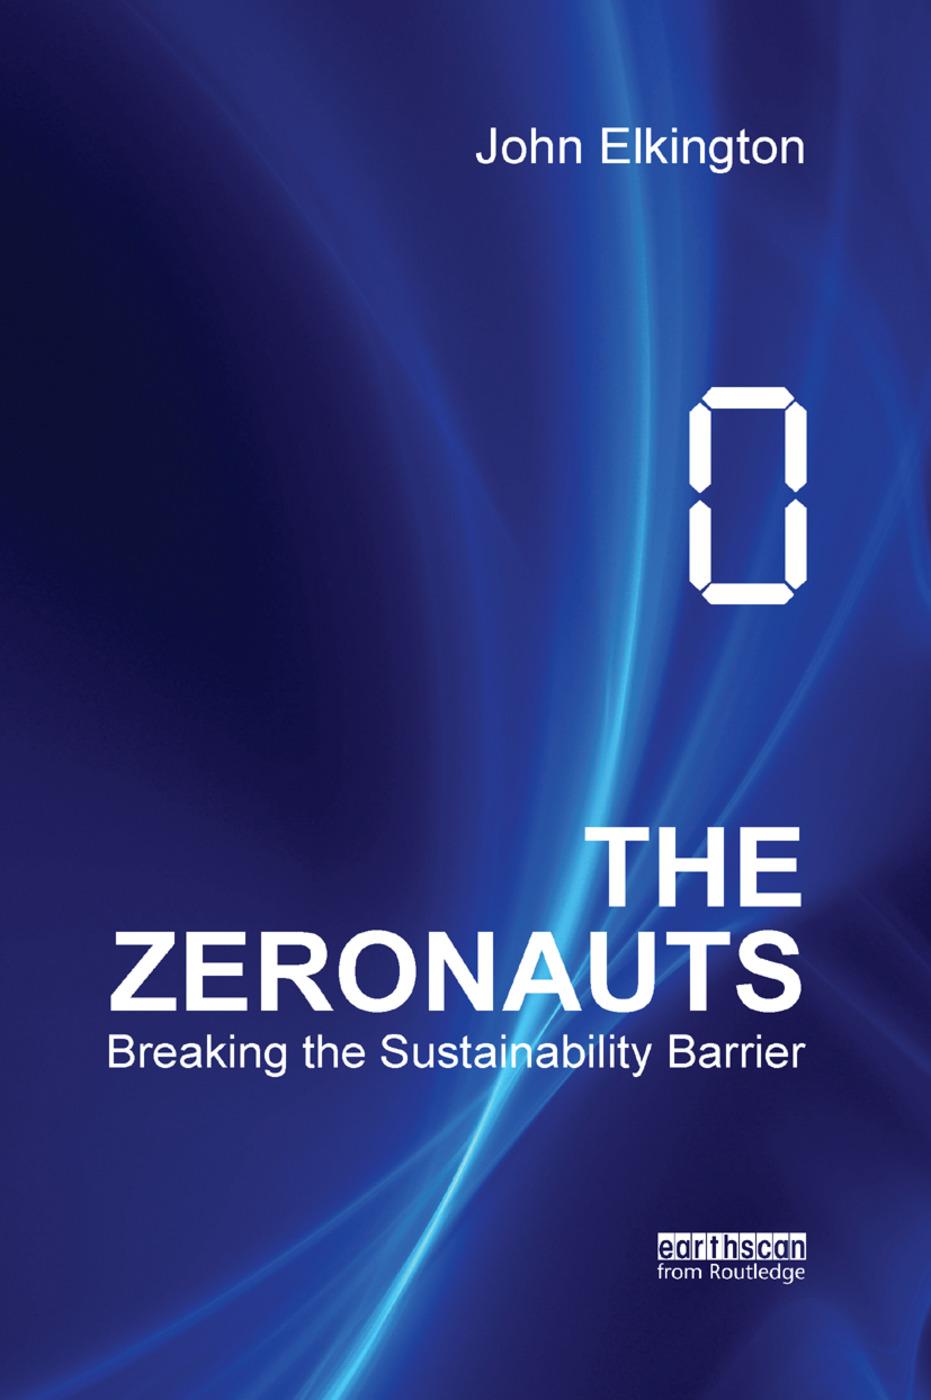 The Zeronauts